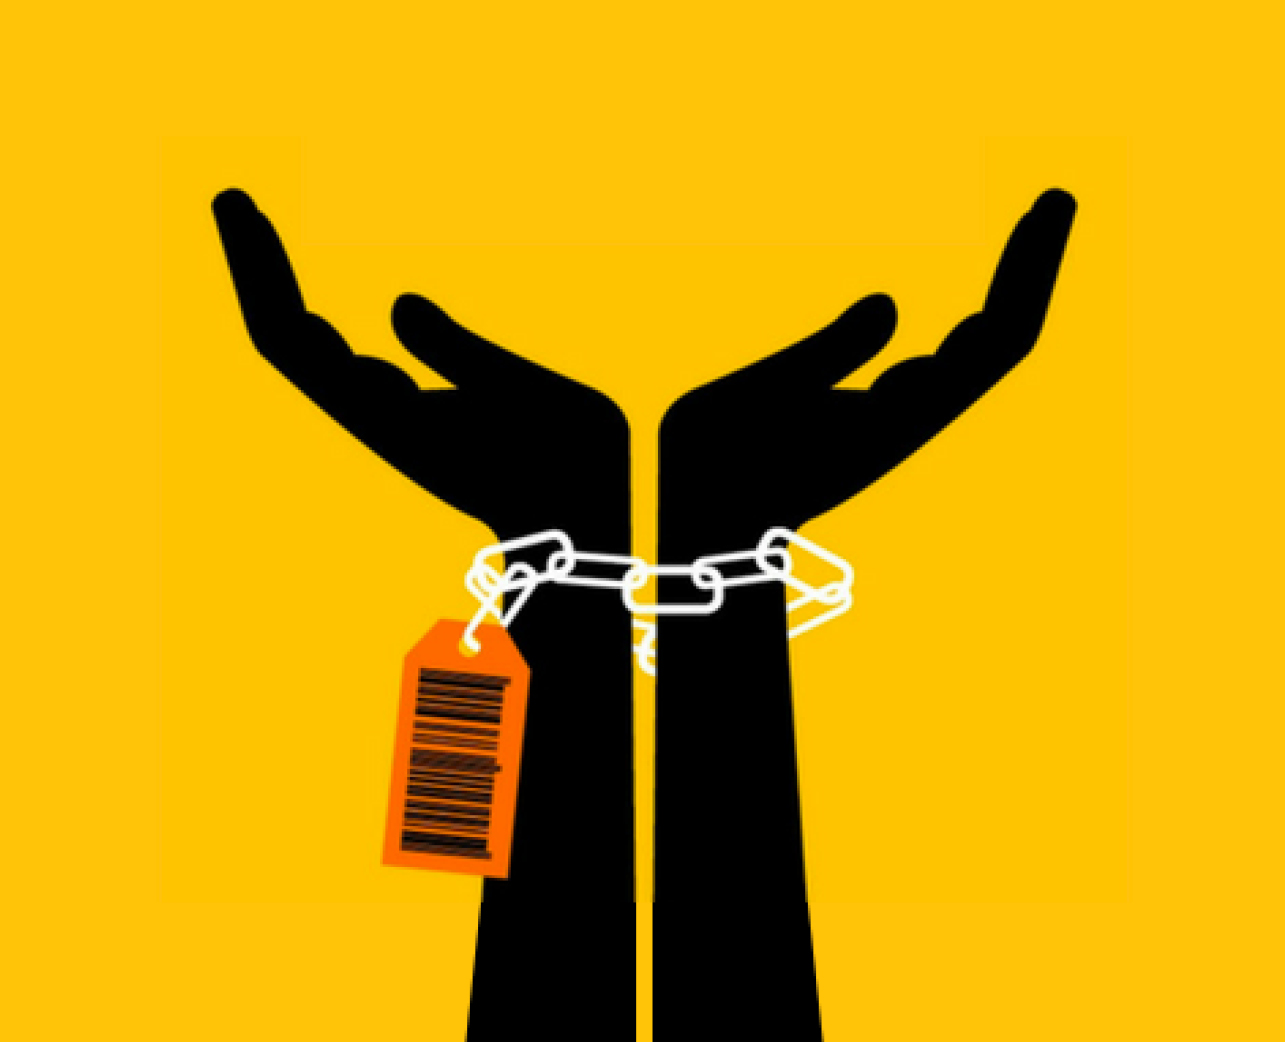 Anti-Trafficking Society (YATS)